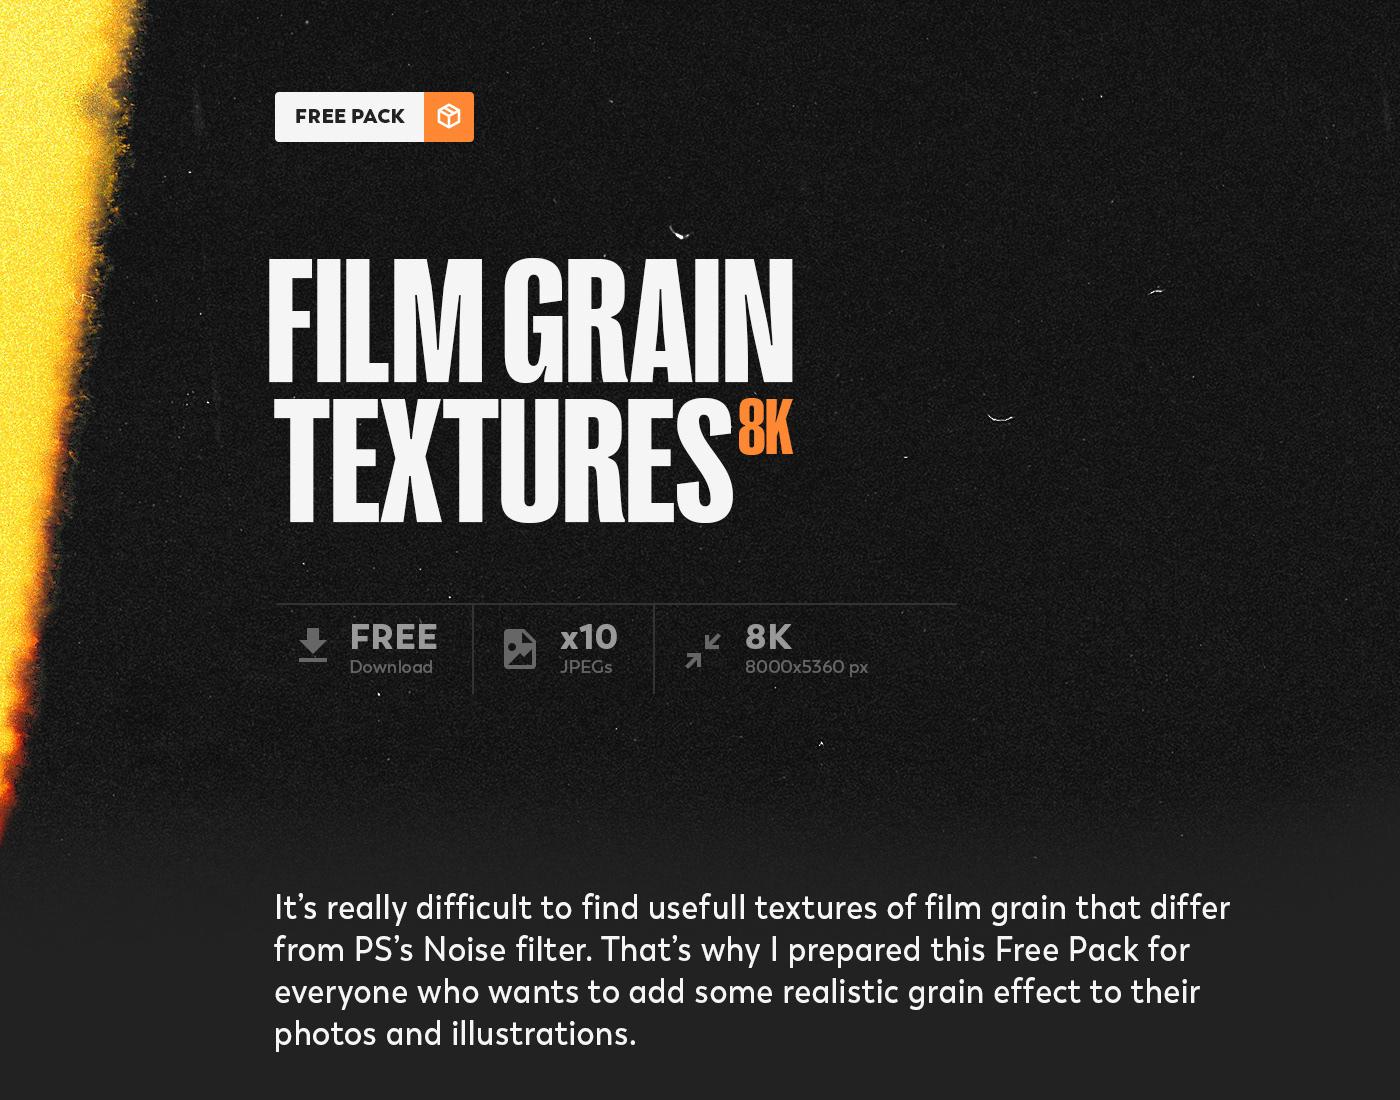 Film   grain texture free CG lomo photo camera noise dust